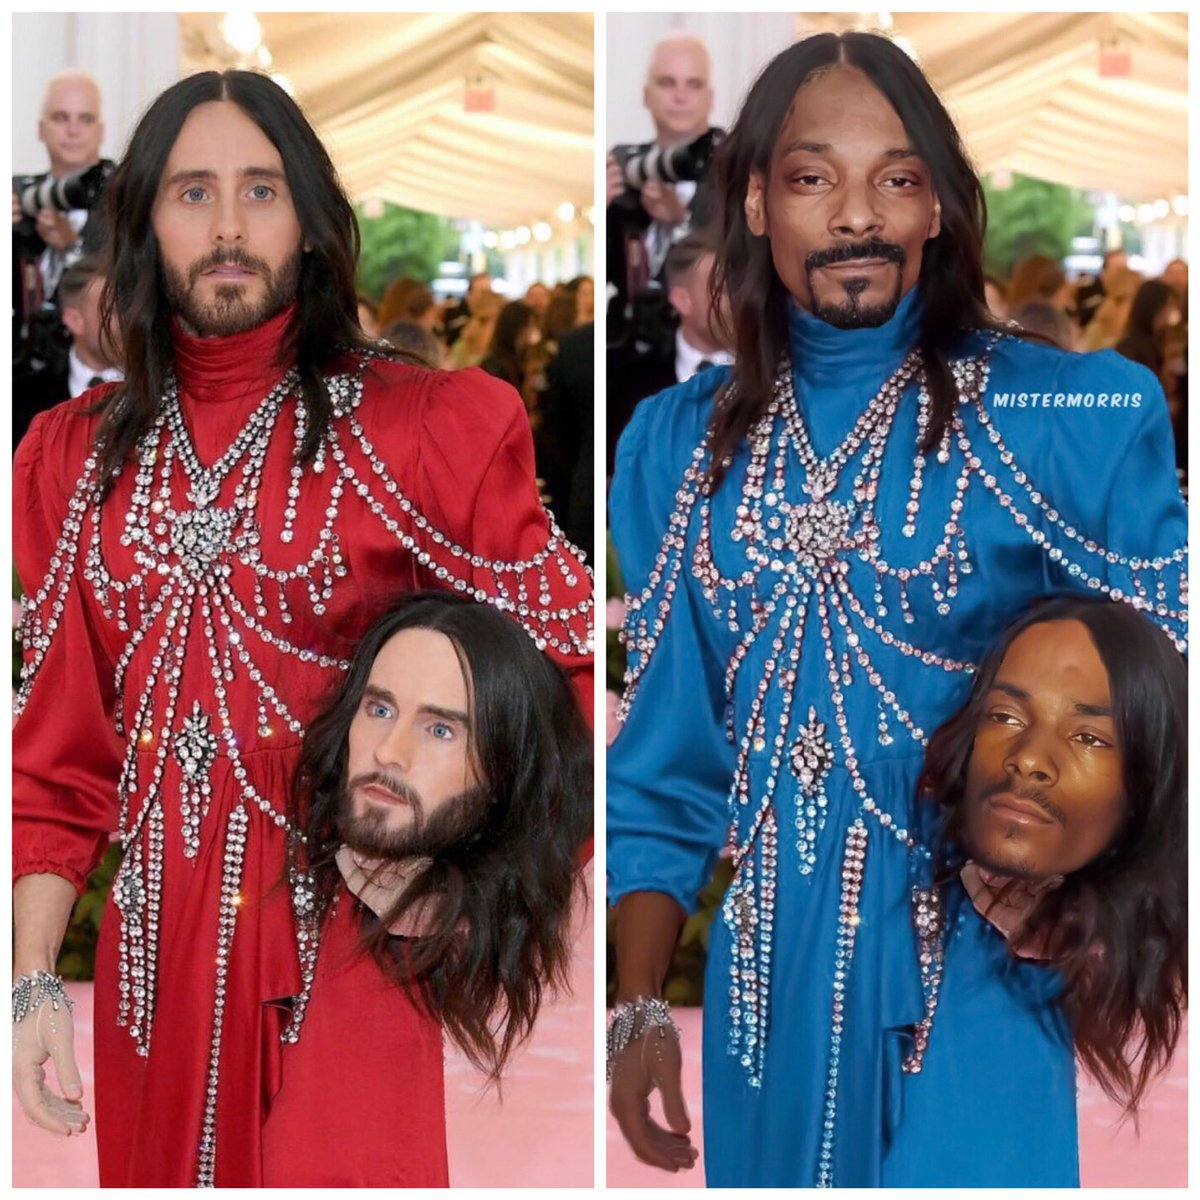 RT @mistermorris55: Who wore it best? @SnoopDogg or @JaredLeto https://t.co/mScpcvJXSe